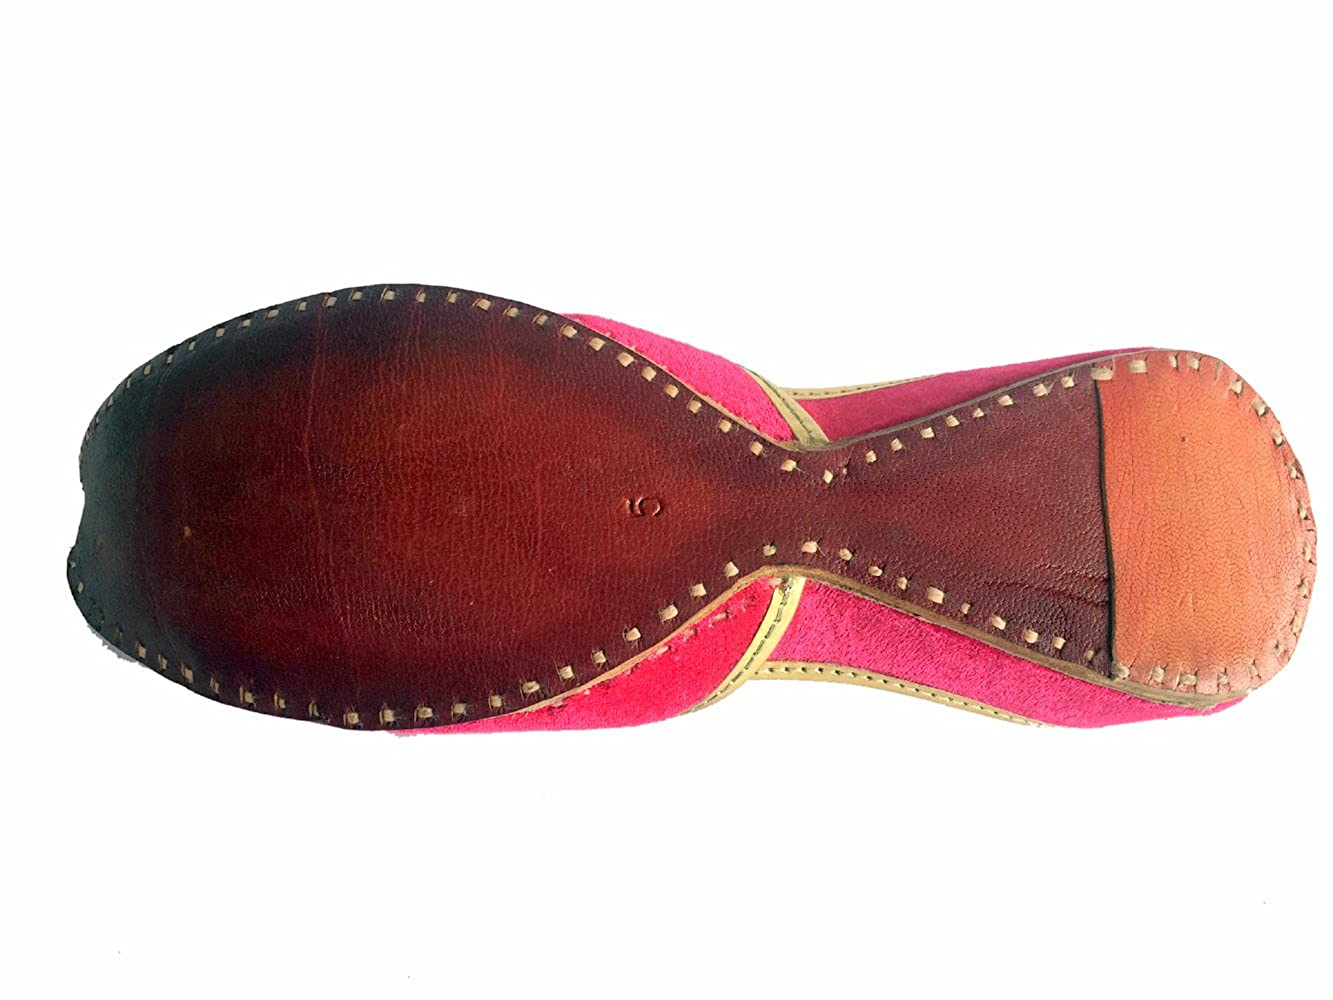 Step n Style Womens Pink Khussa Shoes Punjabi Ghungroo Jutti Ethnic Mojari Handmade Ballerina Shoes Casual Sandal